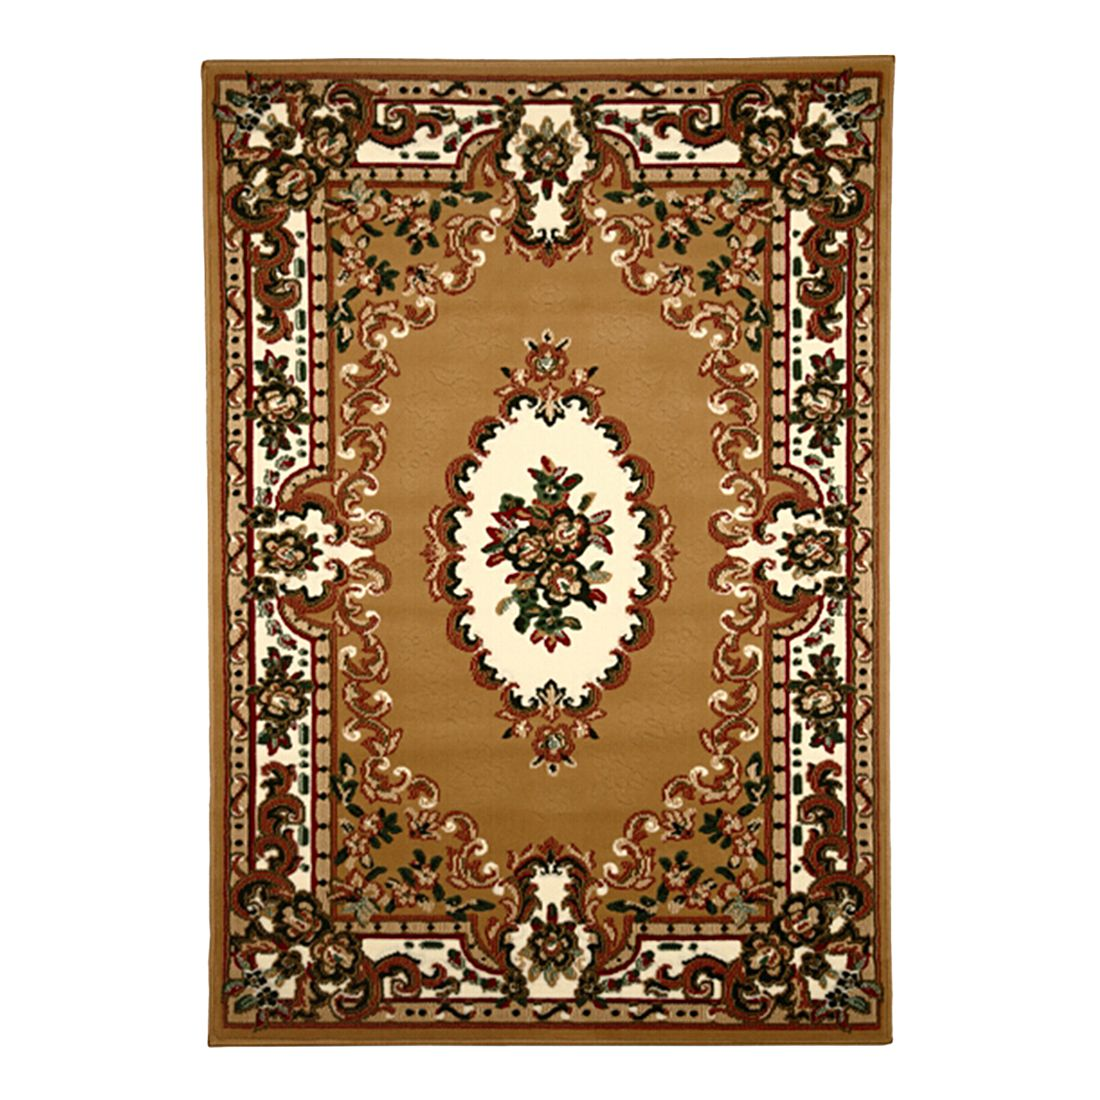 Teppich Peking 710490 – Beige – 170 x 118 cm, KC-Handel kaufen